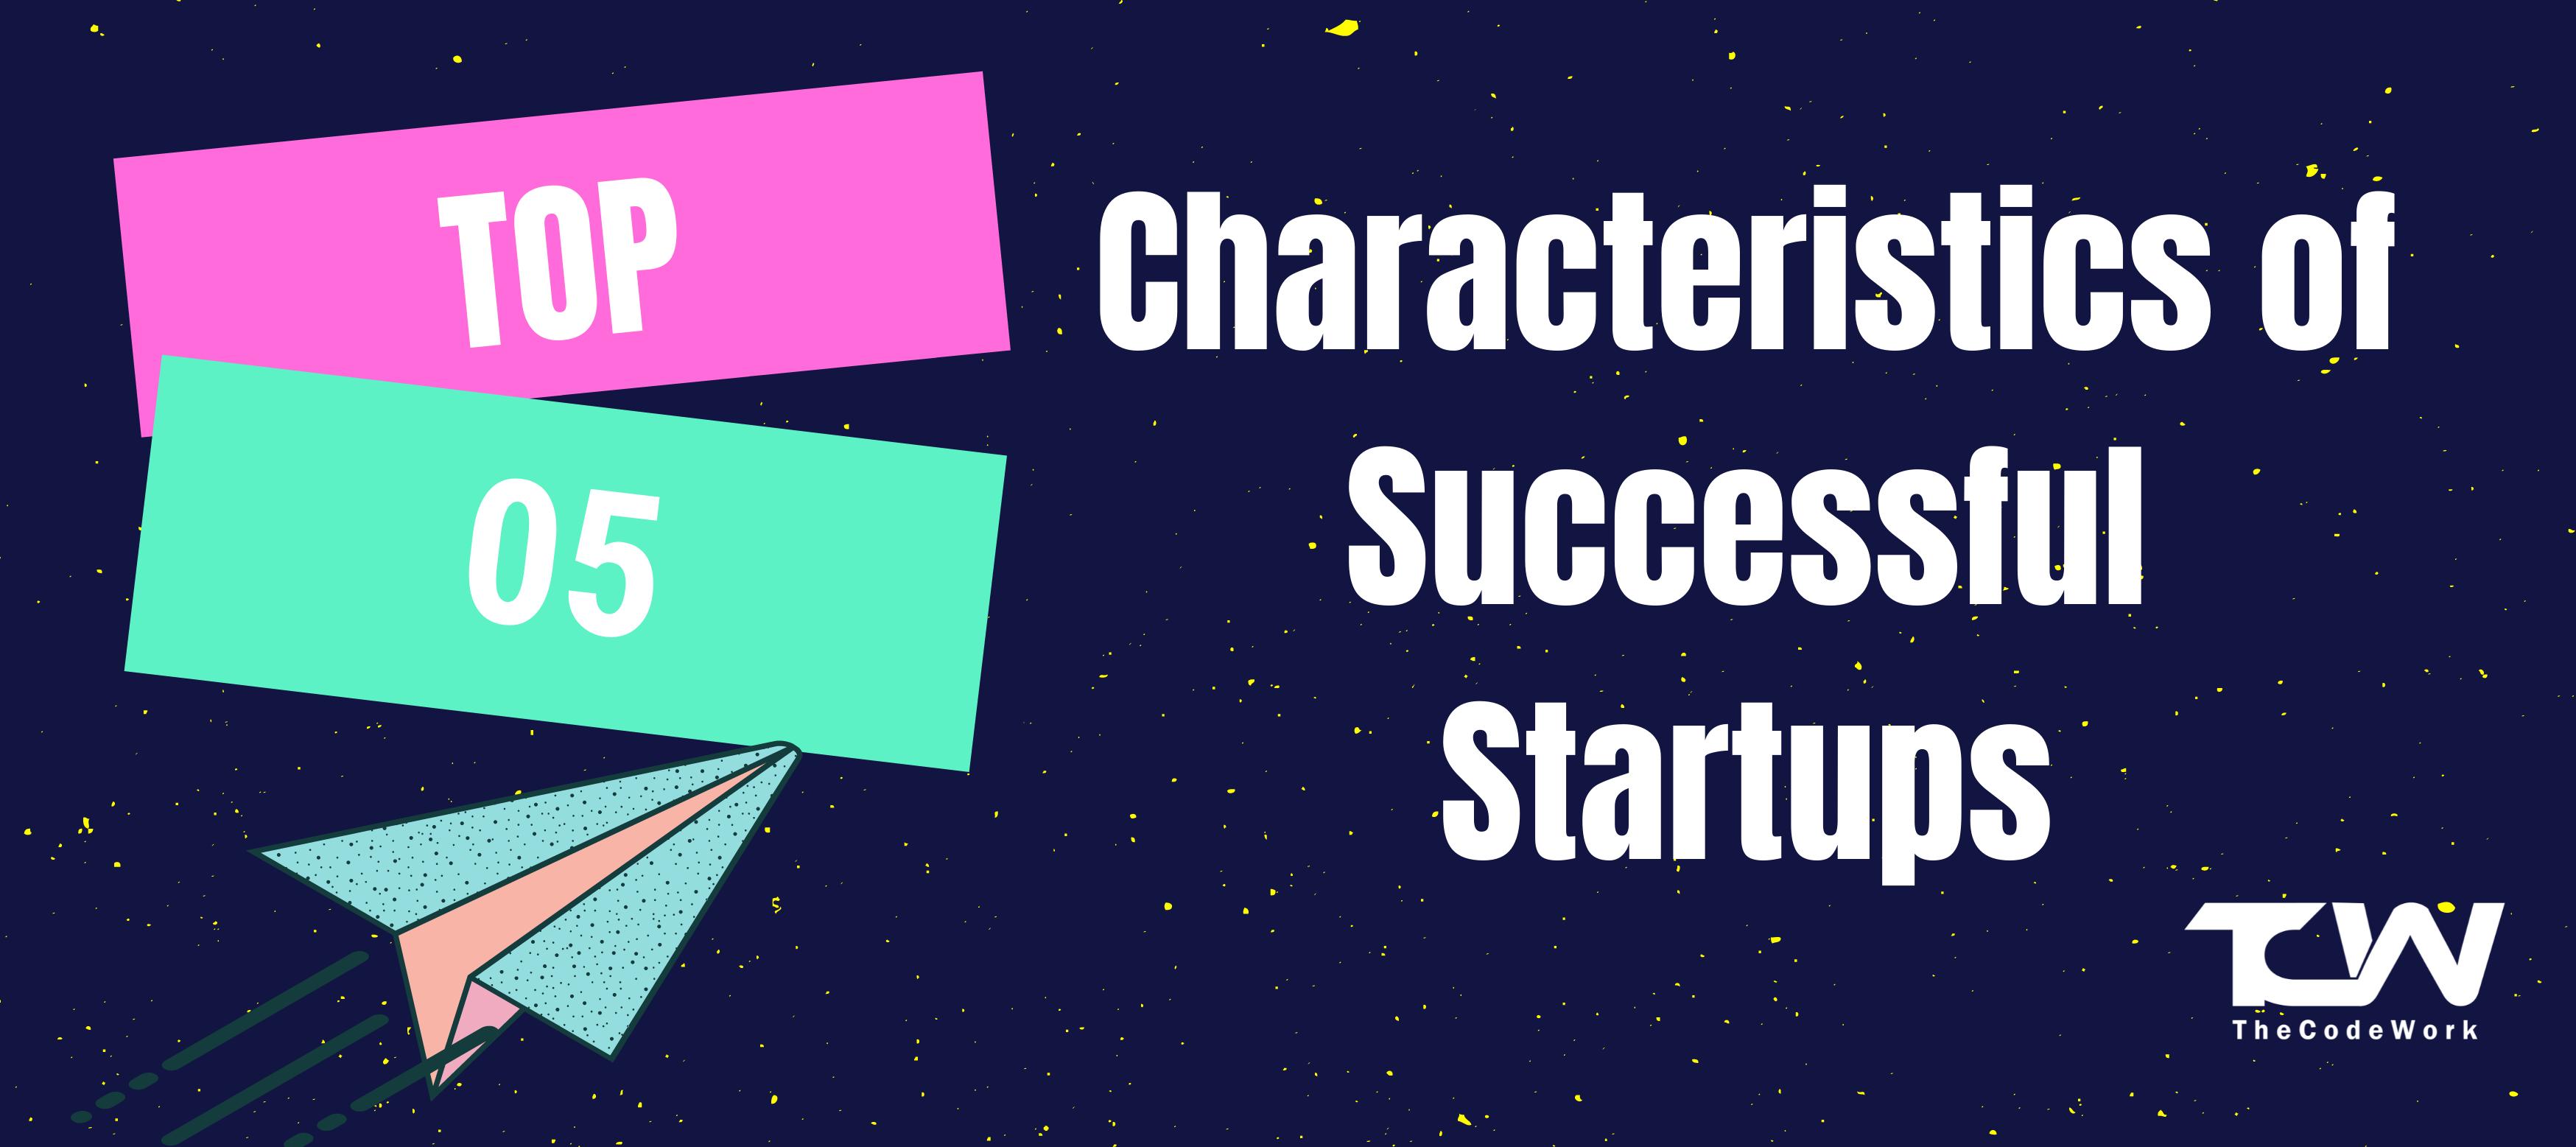 Top 5 Characteristics of successful startups